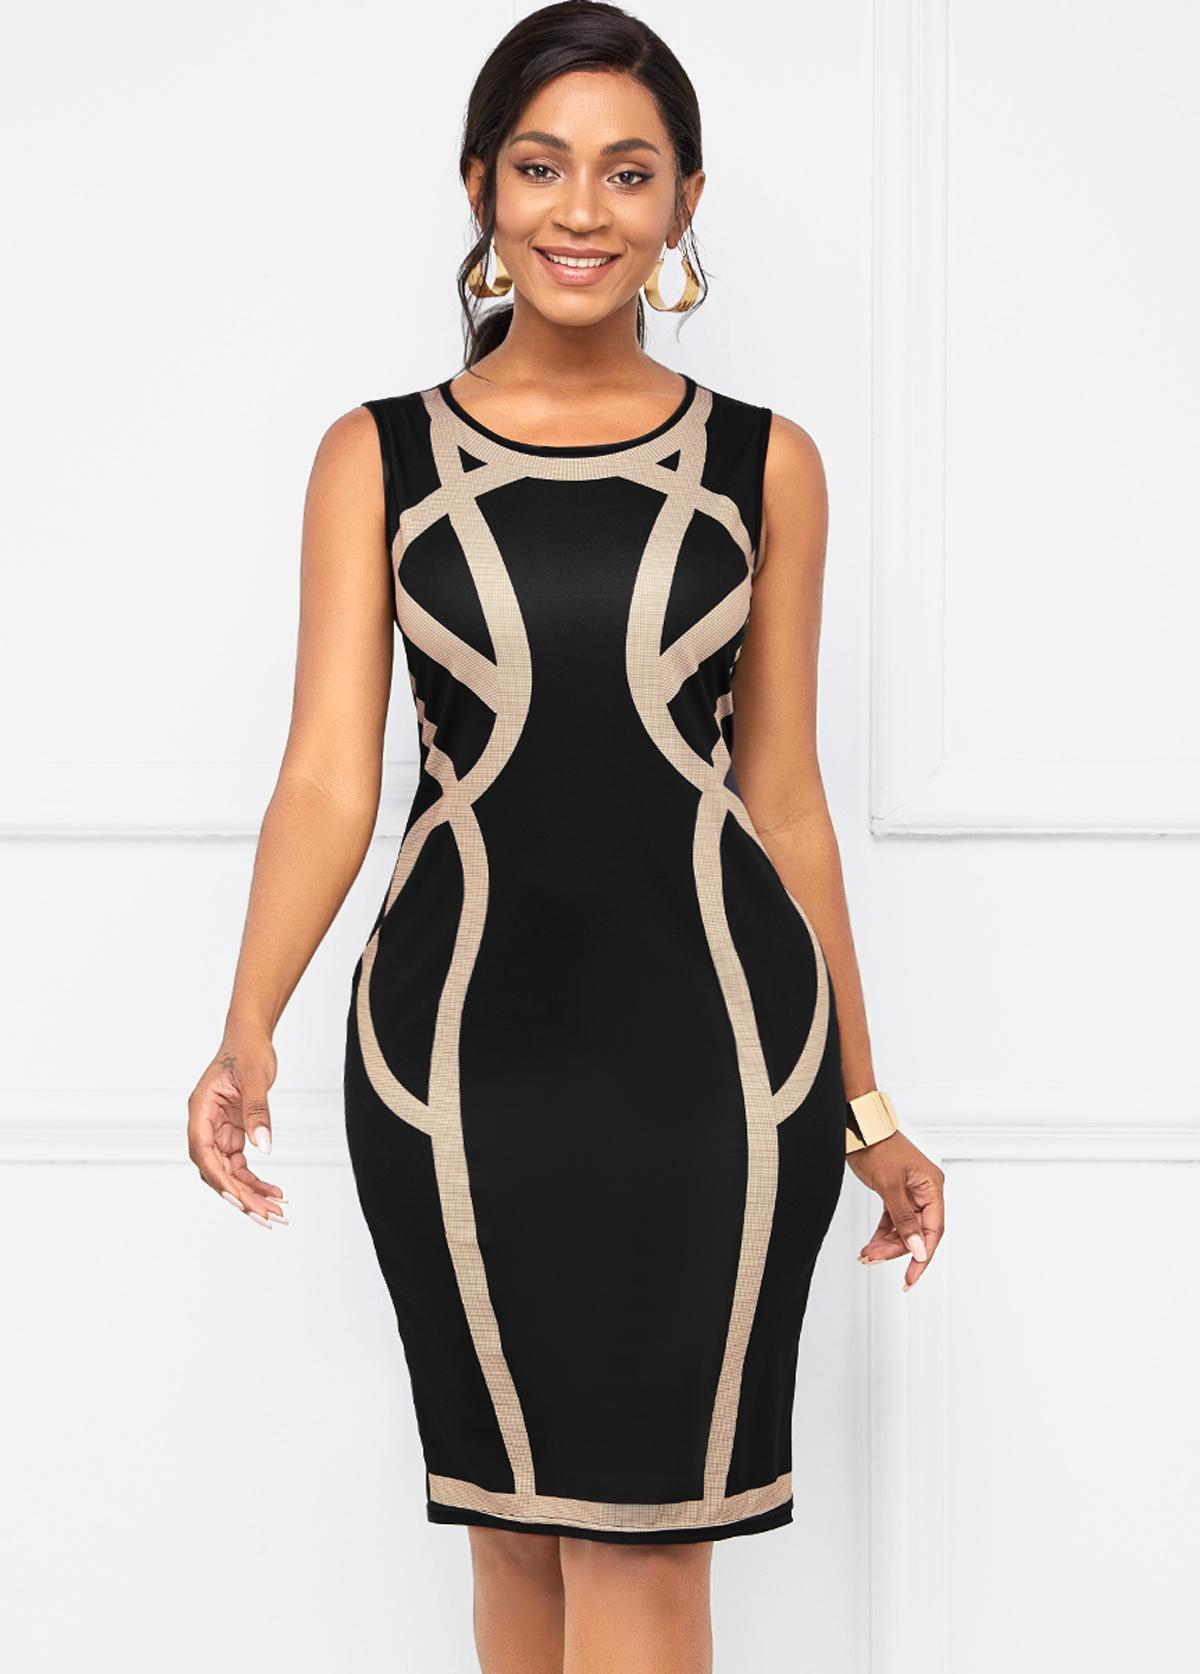 ROTITA Sleeveless Contrast Round Neck Bodycon Dress